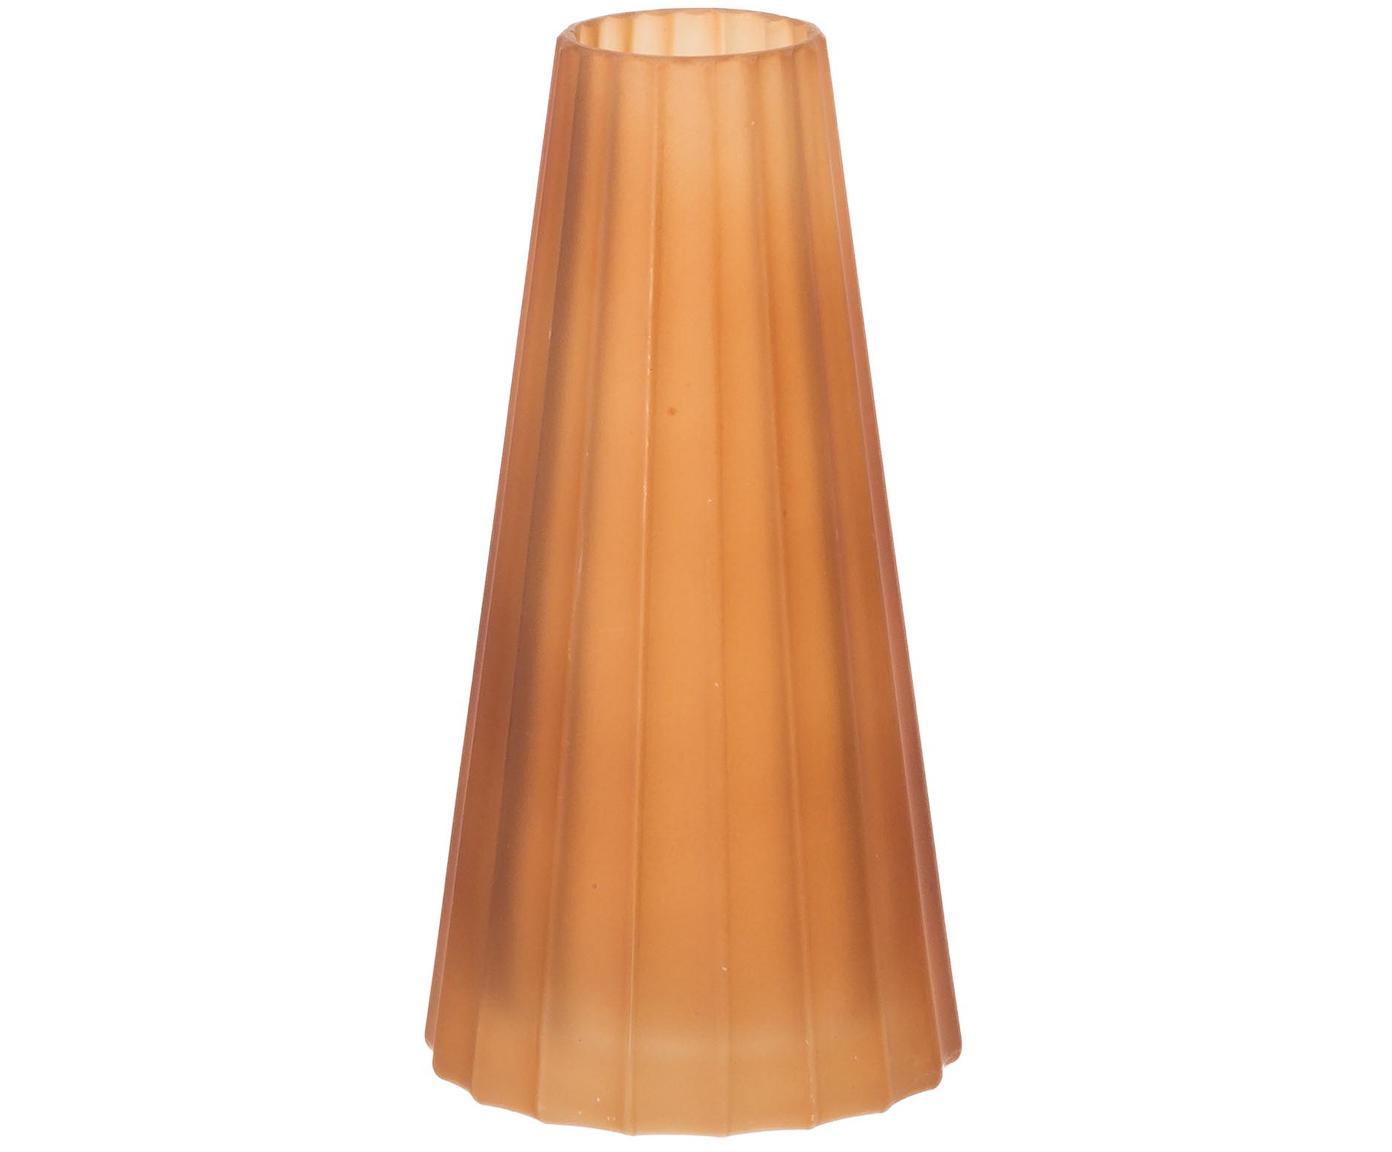 Glas-Vase Vilja, Glas, Braun, Ø 8 x H 16 cm